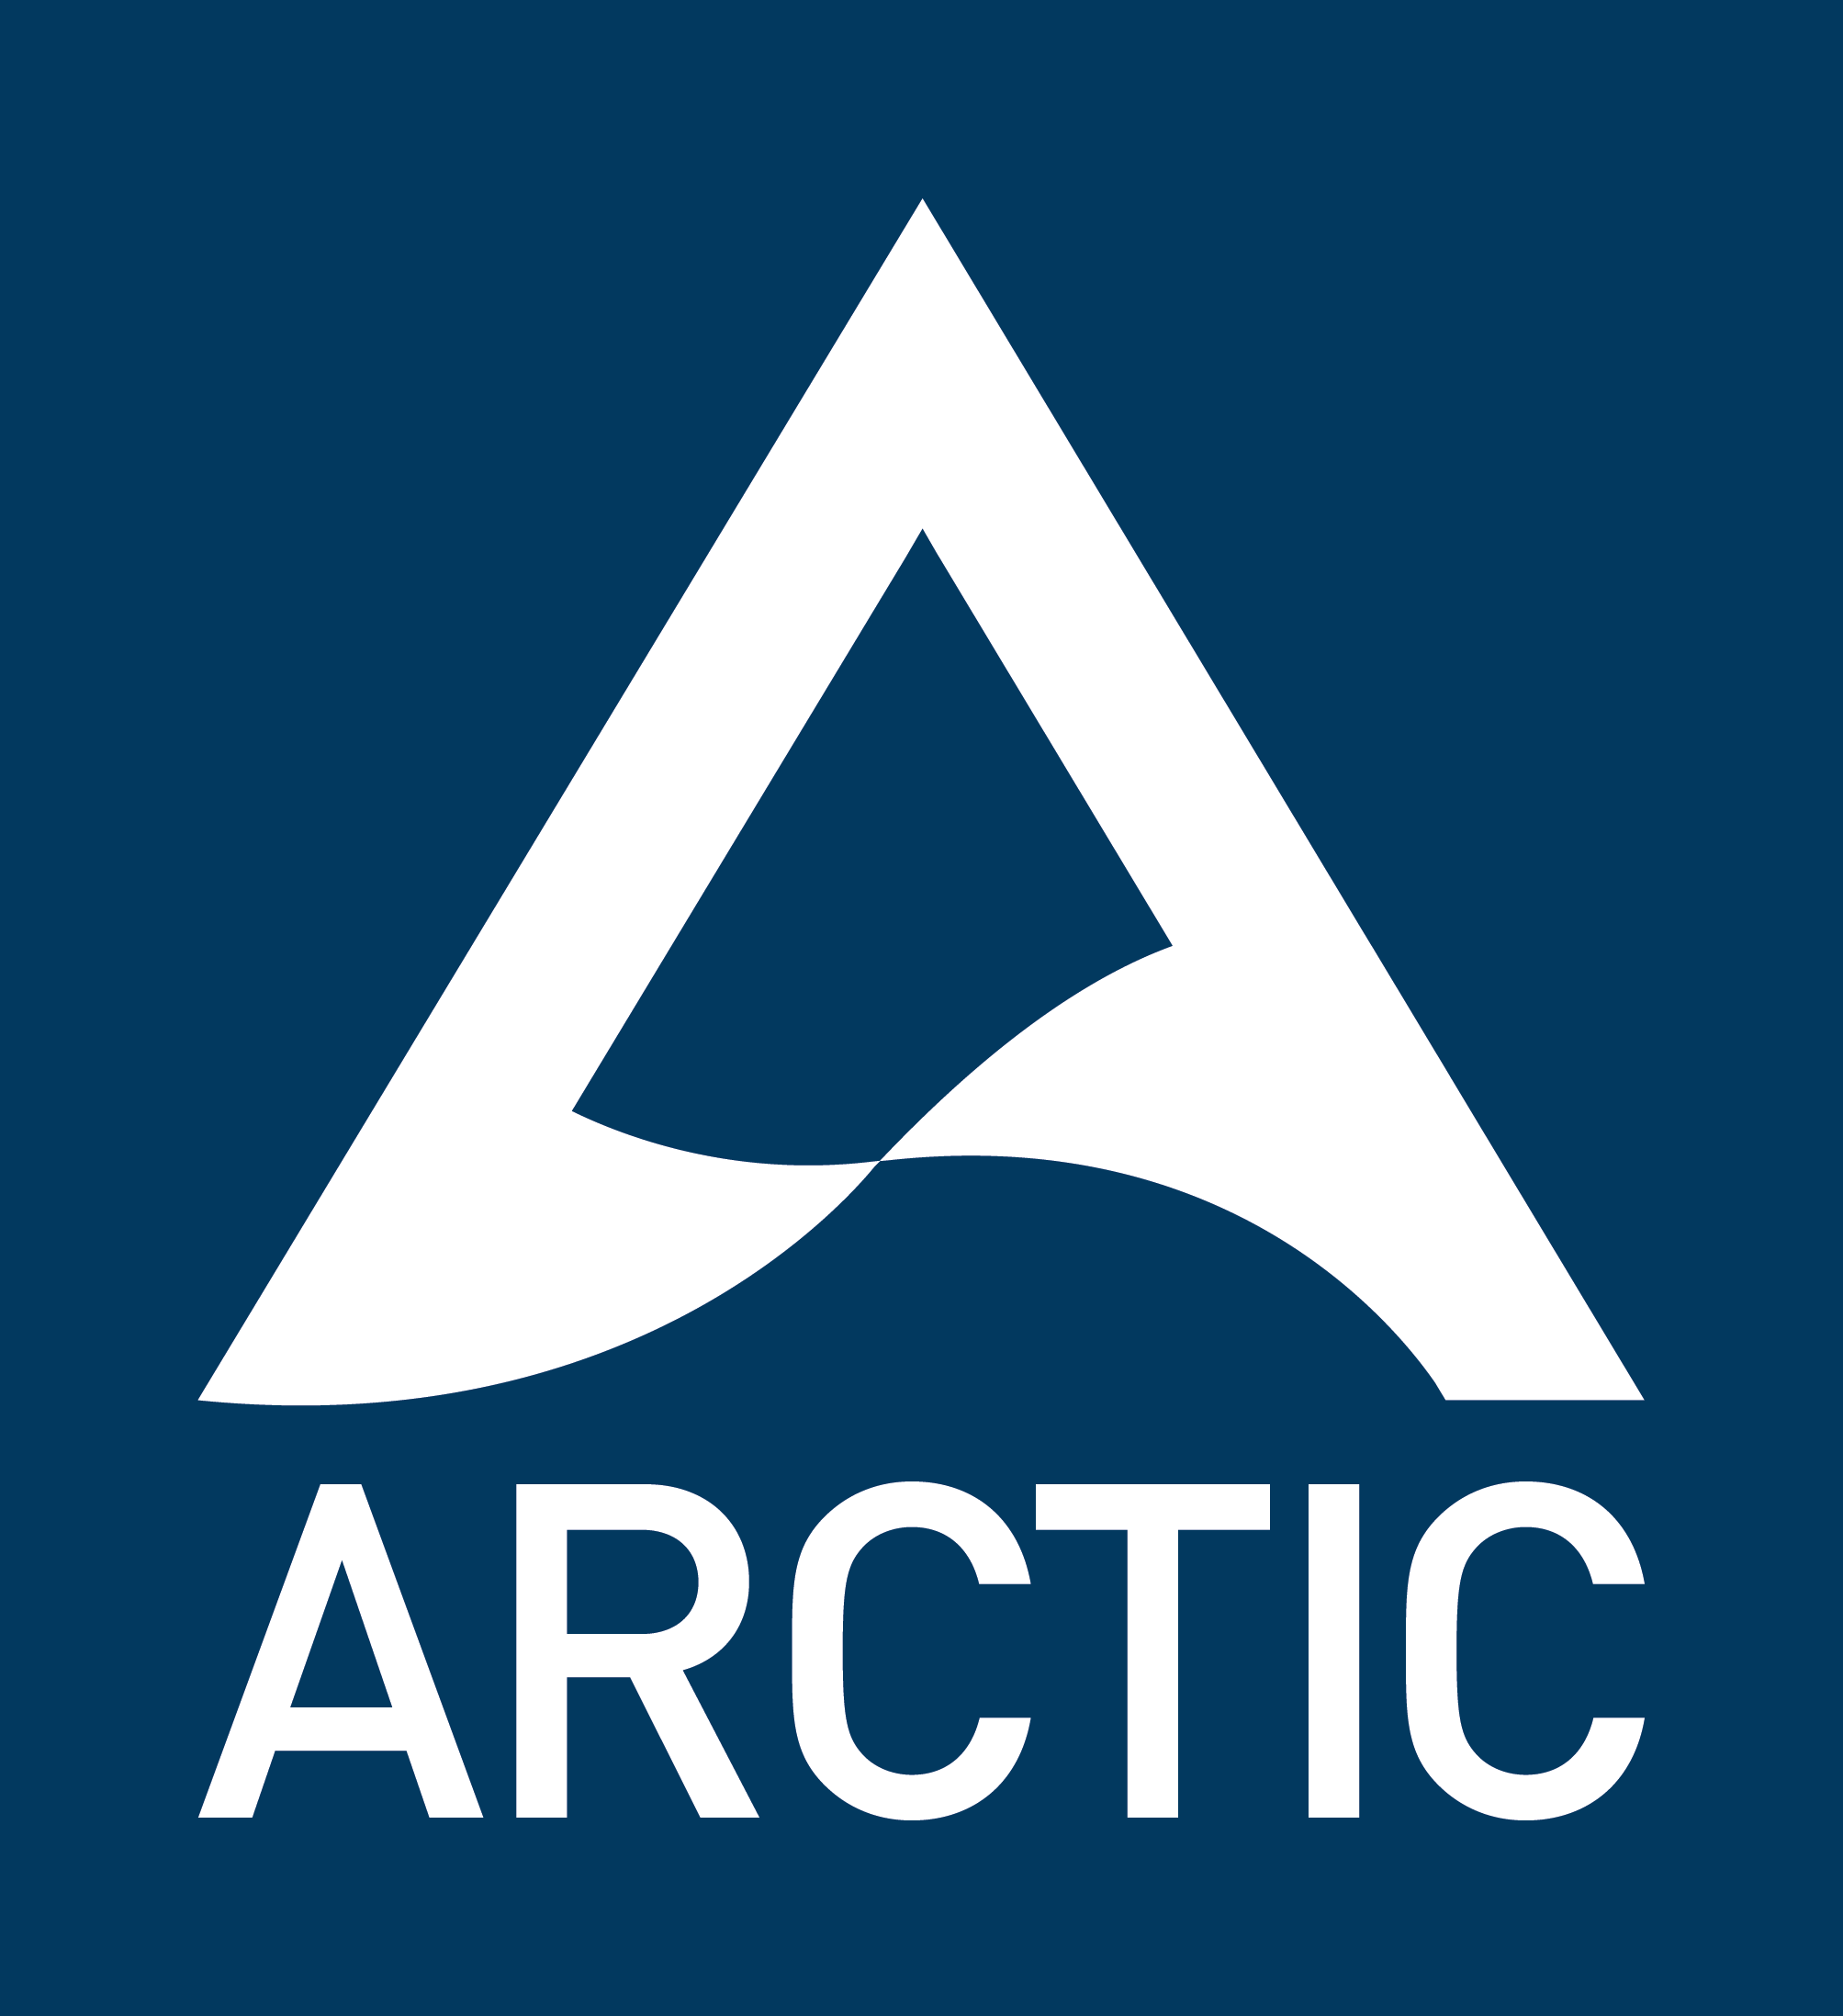 File:ARCTIC logo white.png.